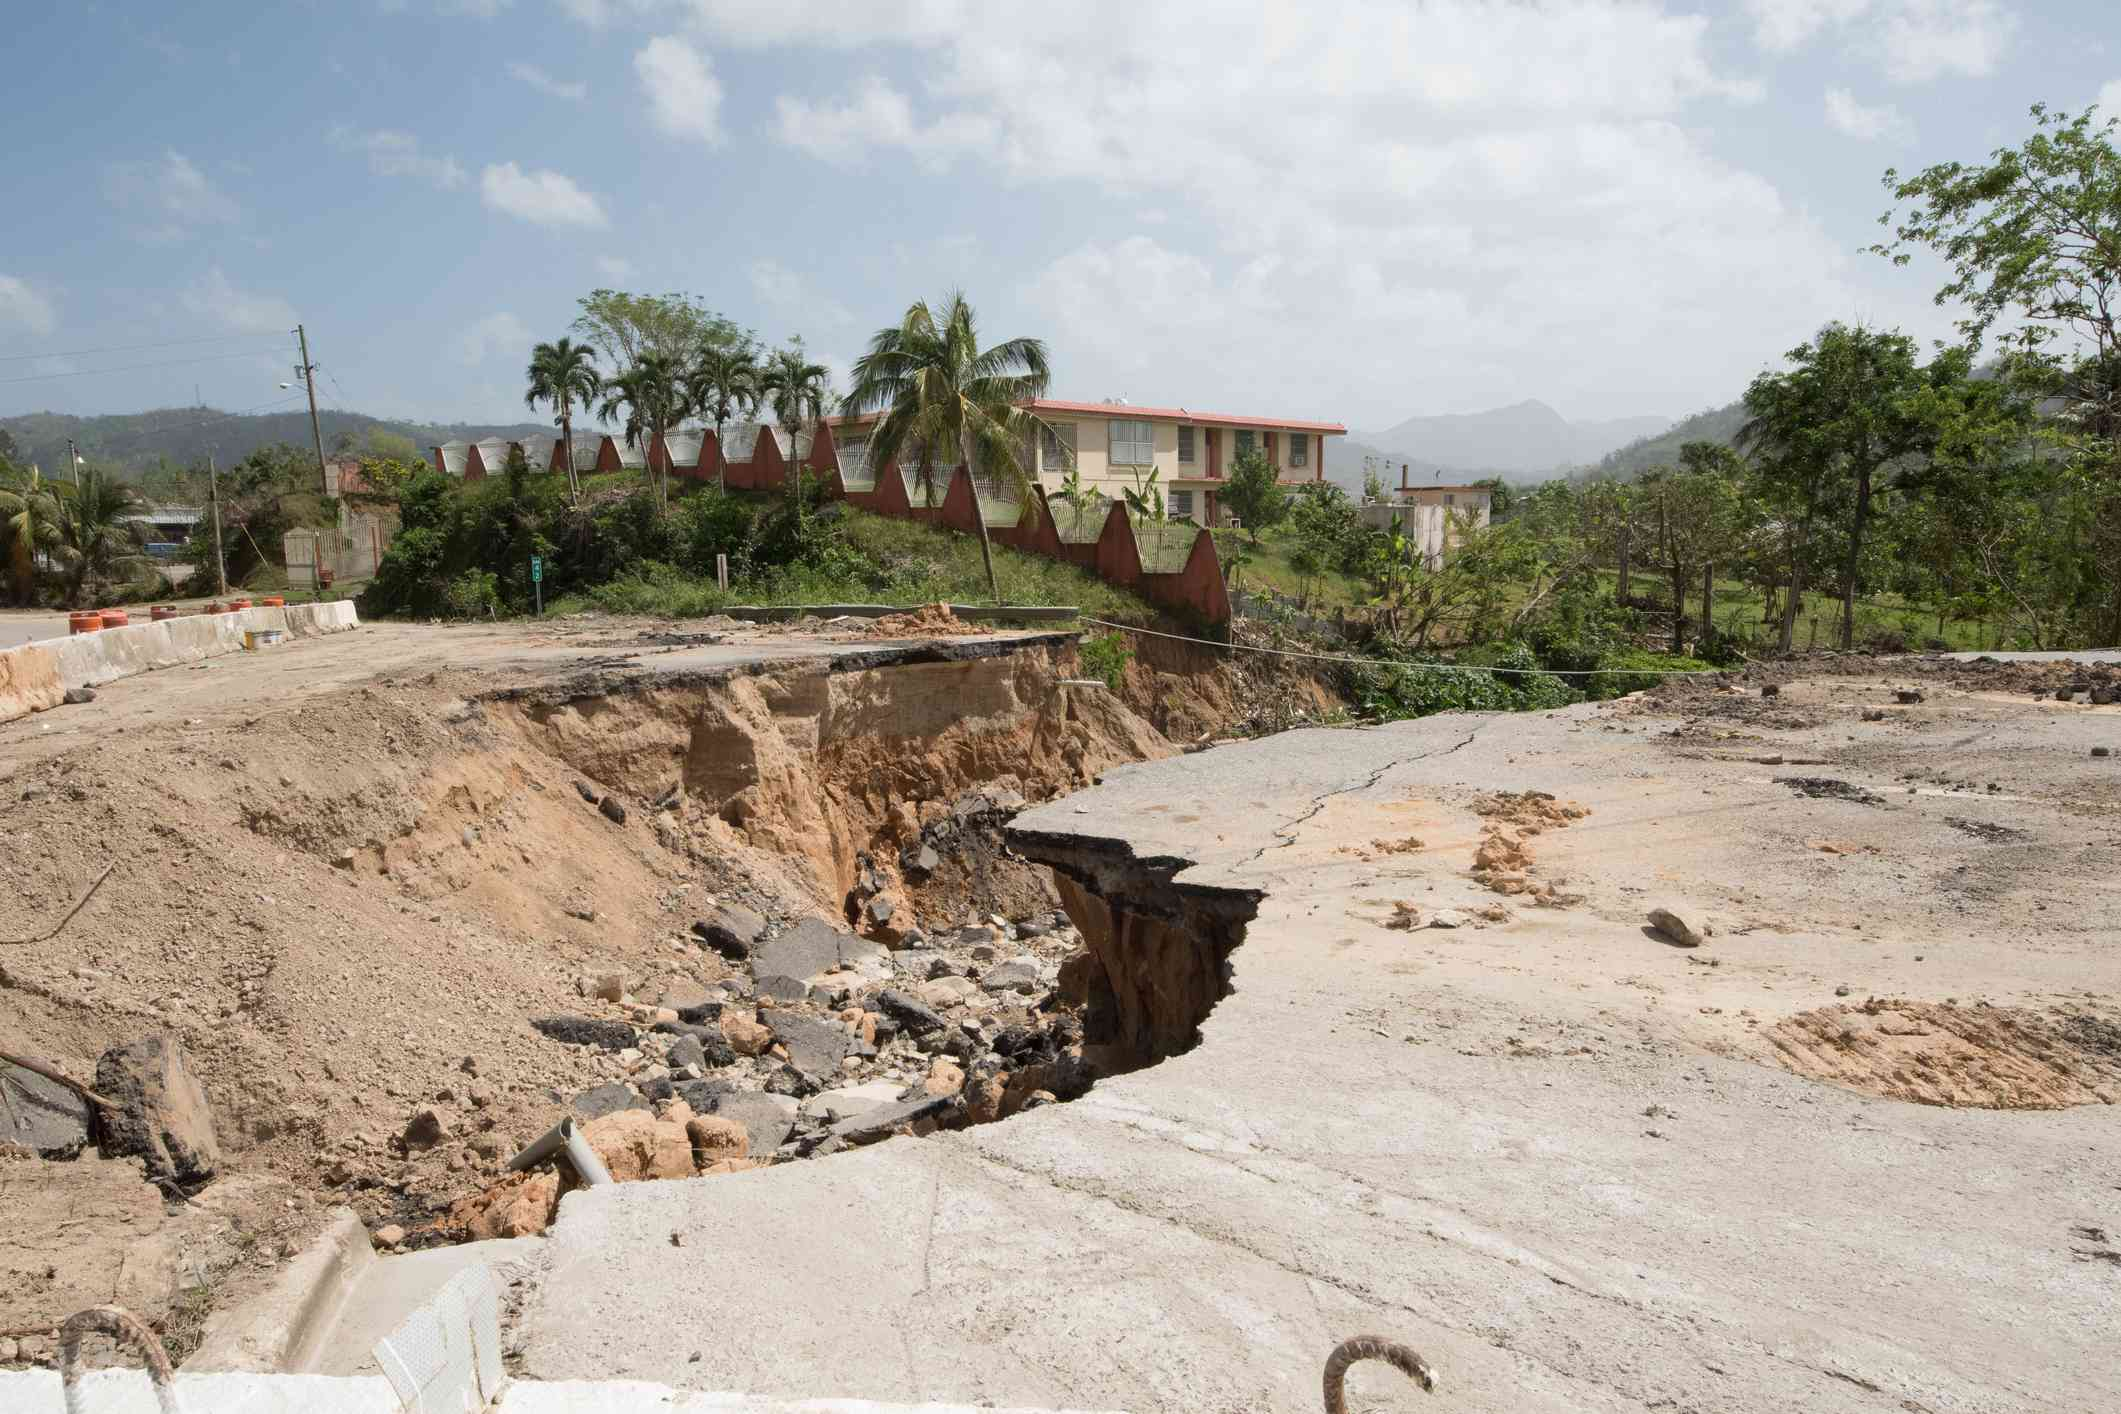 Hurricane Maria 2017 damage in Puerto Rico